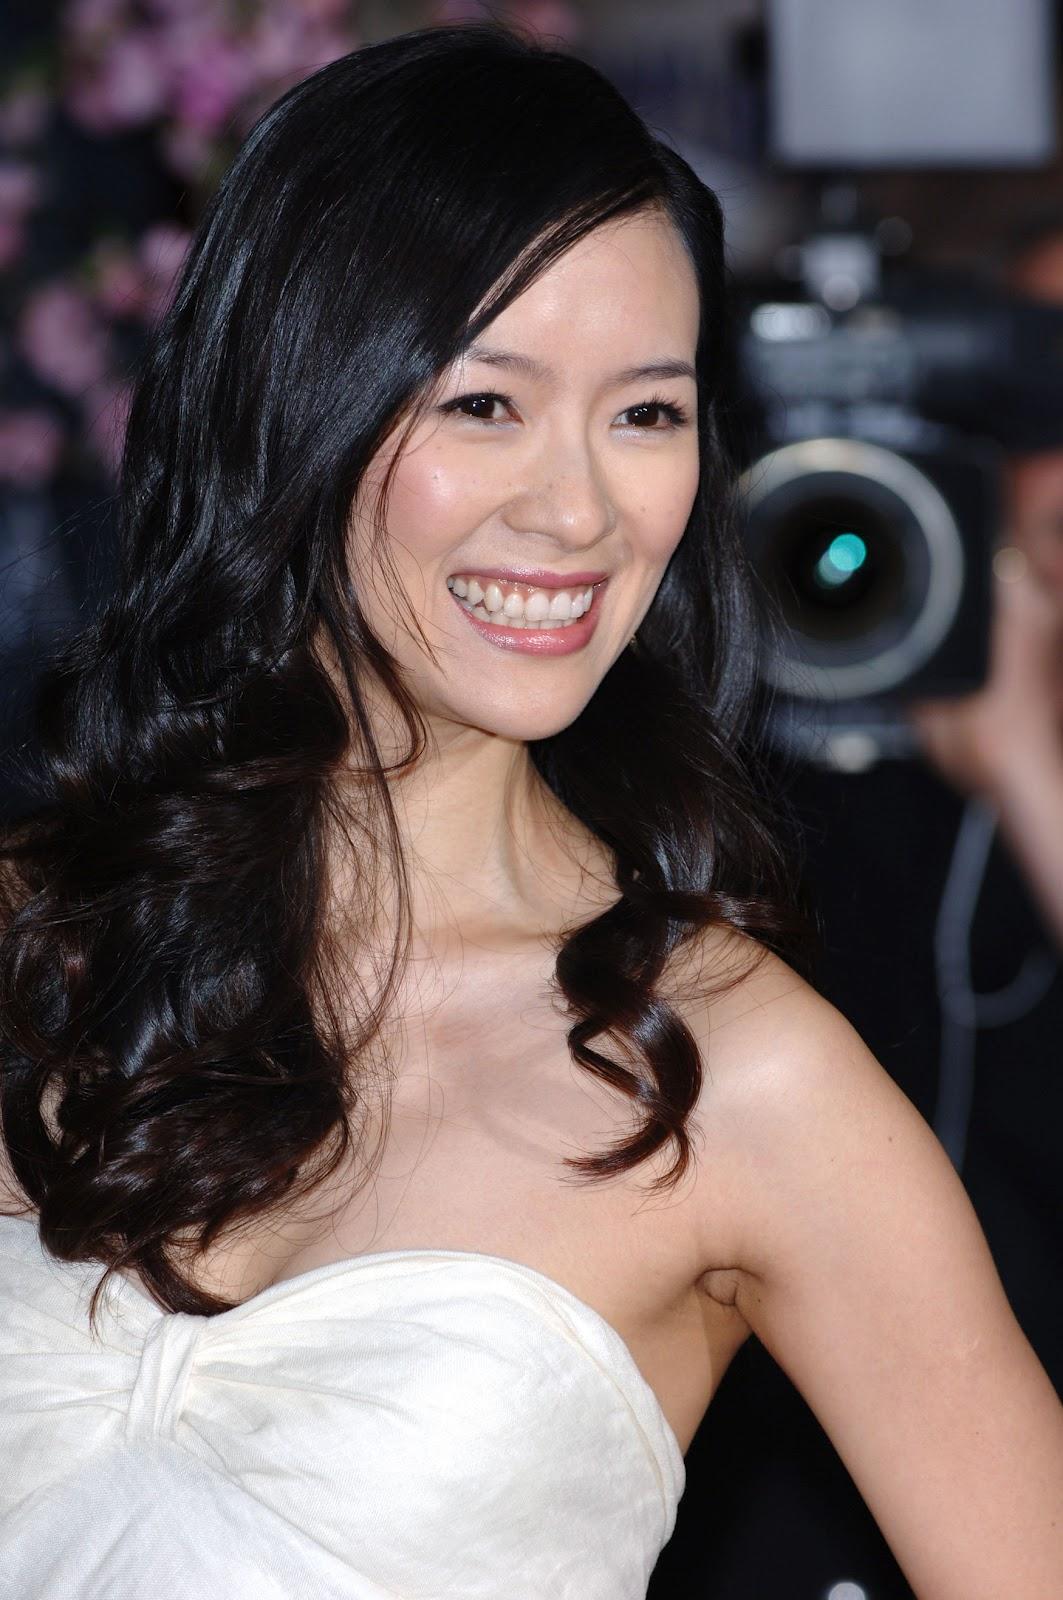 http://3.bp.blogspot.com/-m1g4ZMXVcOY/T2CFoGiHsUI/AAAAAAAABgc/4eY670ajArM/s1600/Zhang+Ziyi+4.jpg